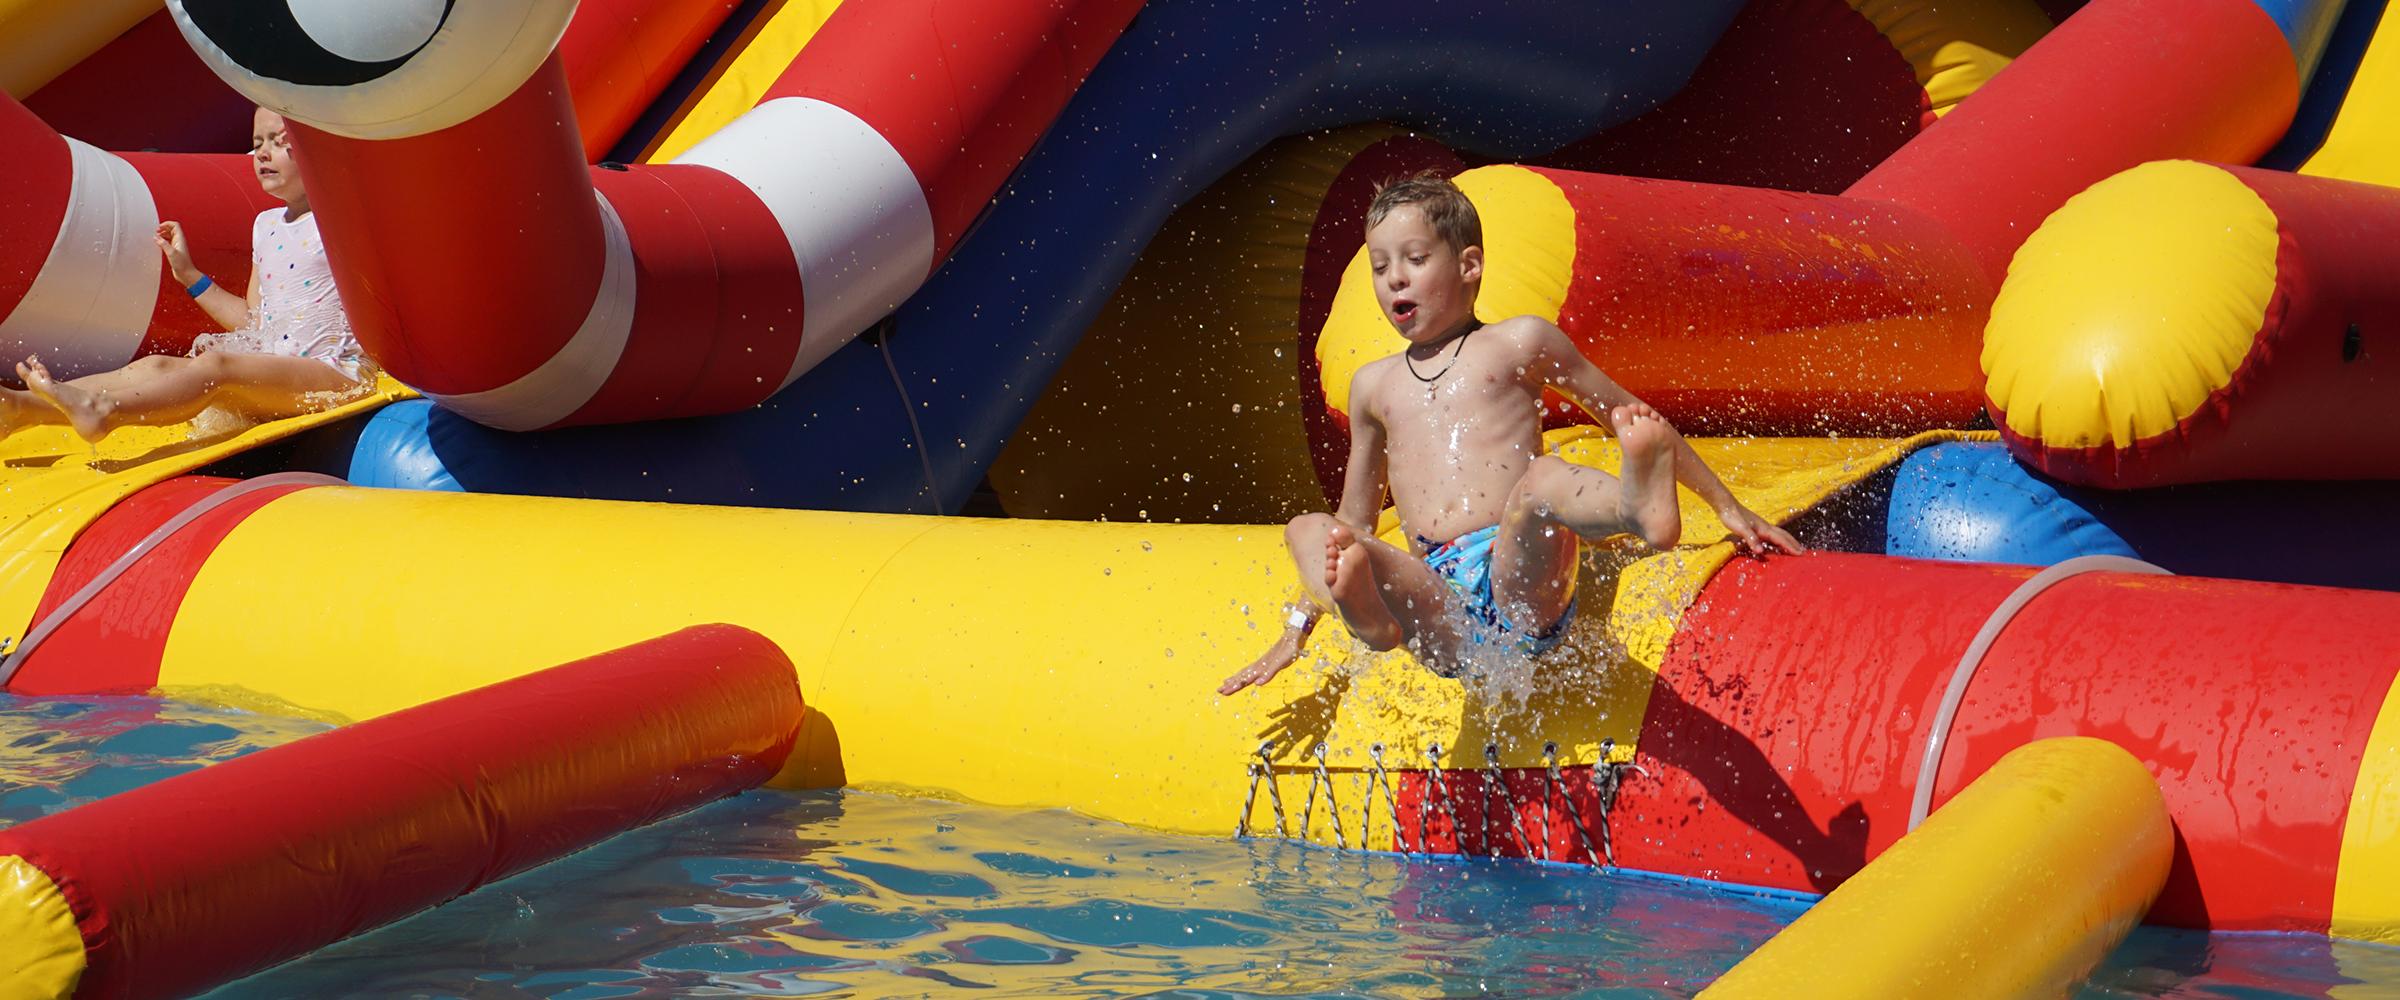 Надувной аквапарк с тремя горками и надувным пандусом Inflatable water park with inflatable ramp GAIRSPORT 2